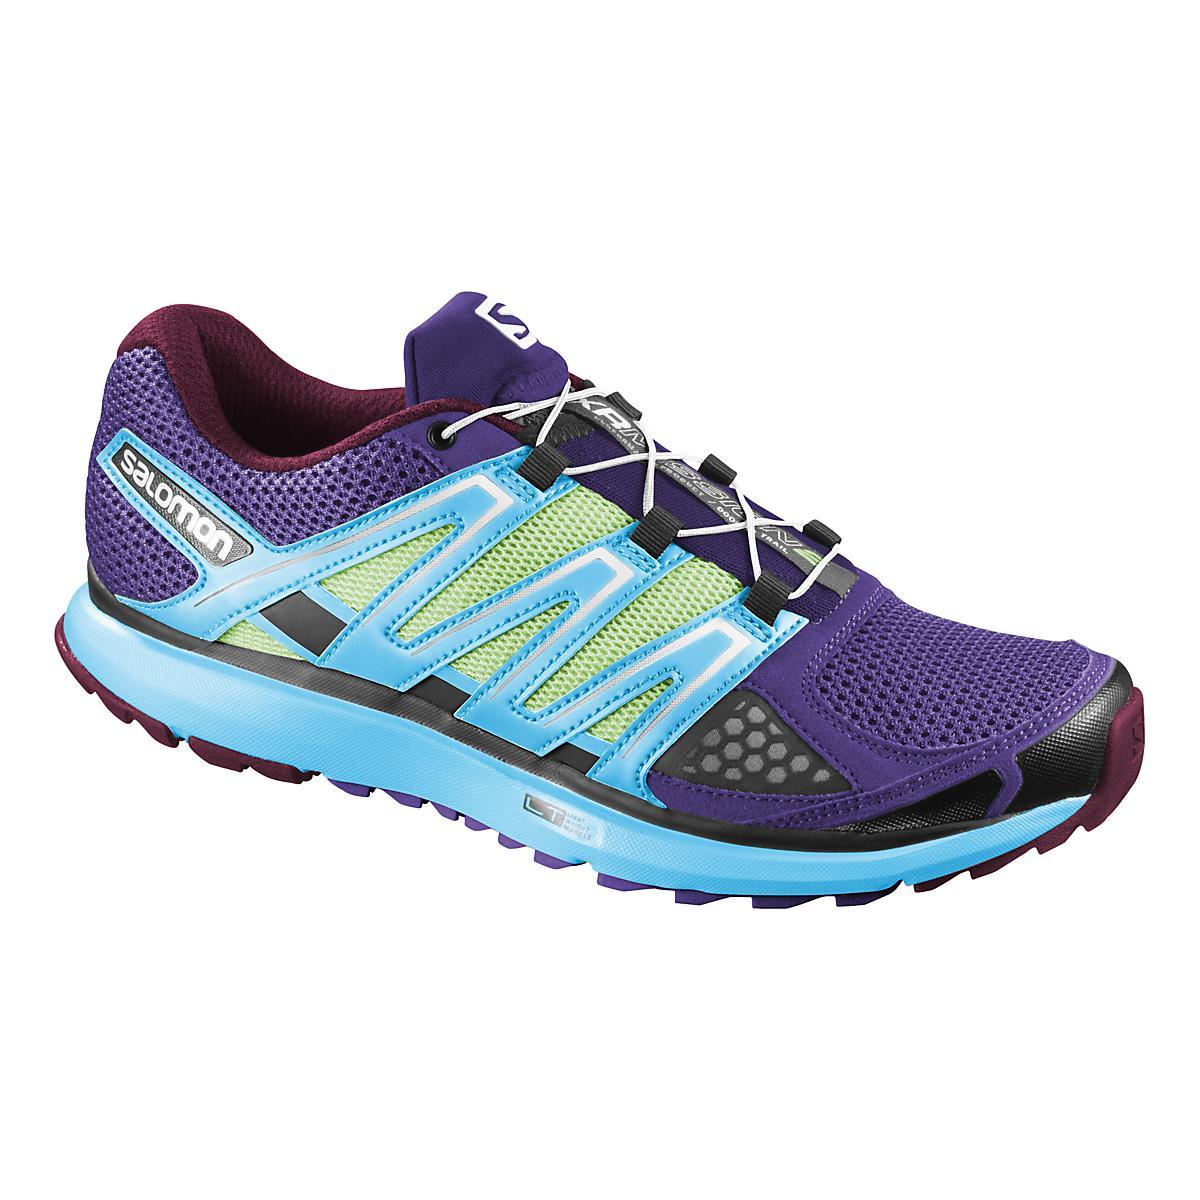 Salomon X Scream Running Shoe Women